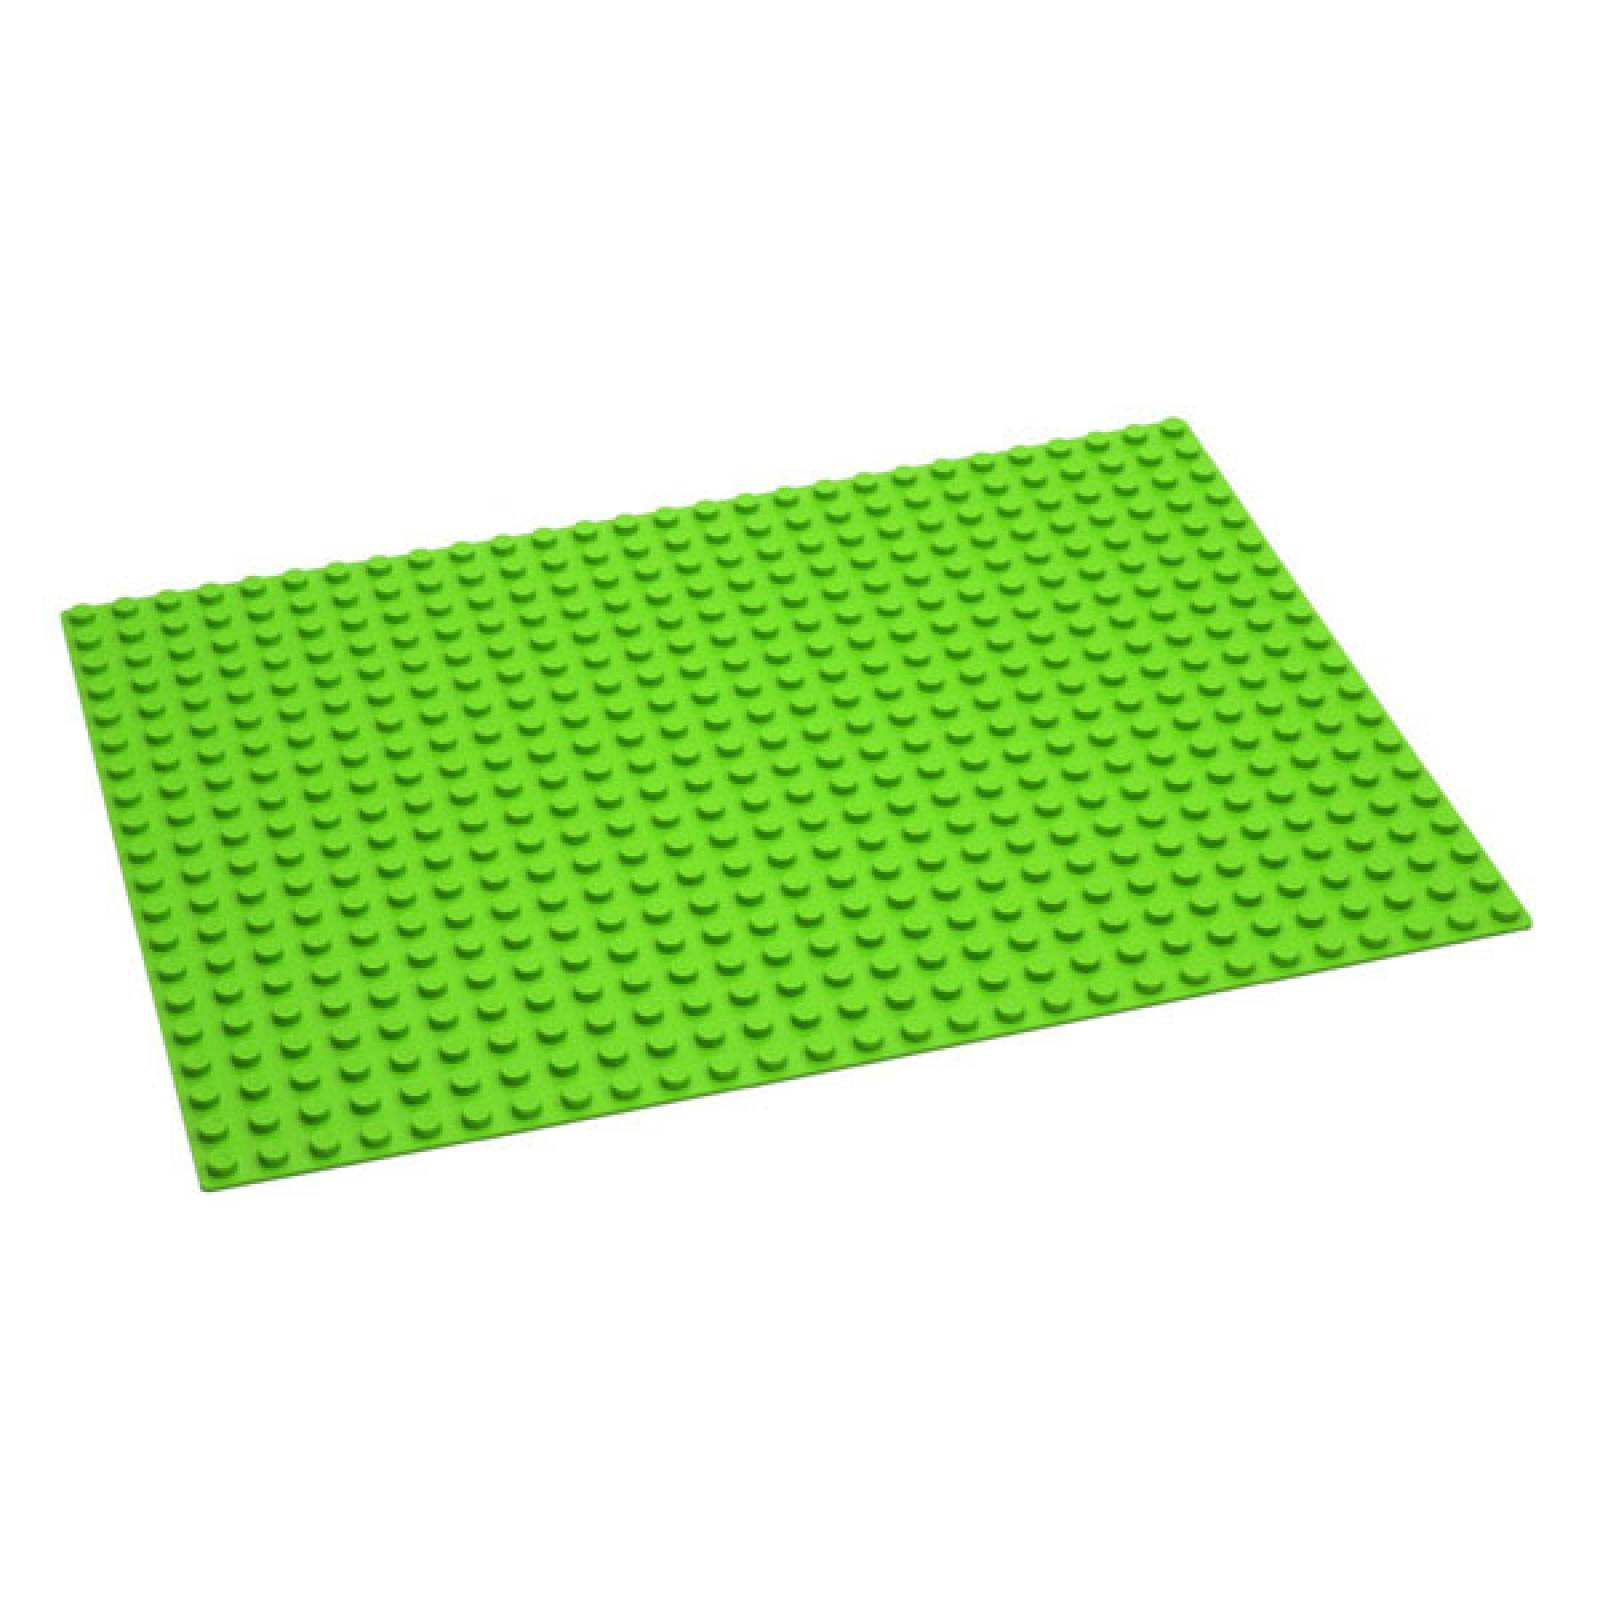 Hubelino Green Marble Run Base Plate 4+